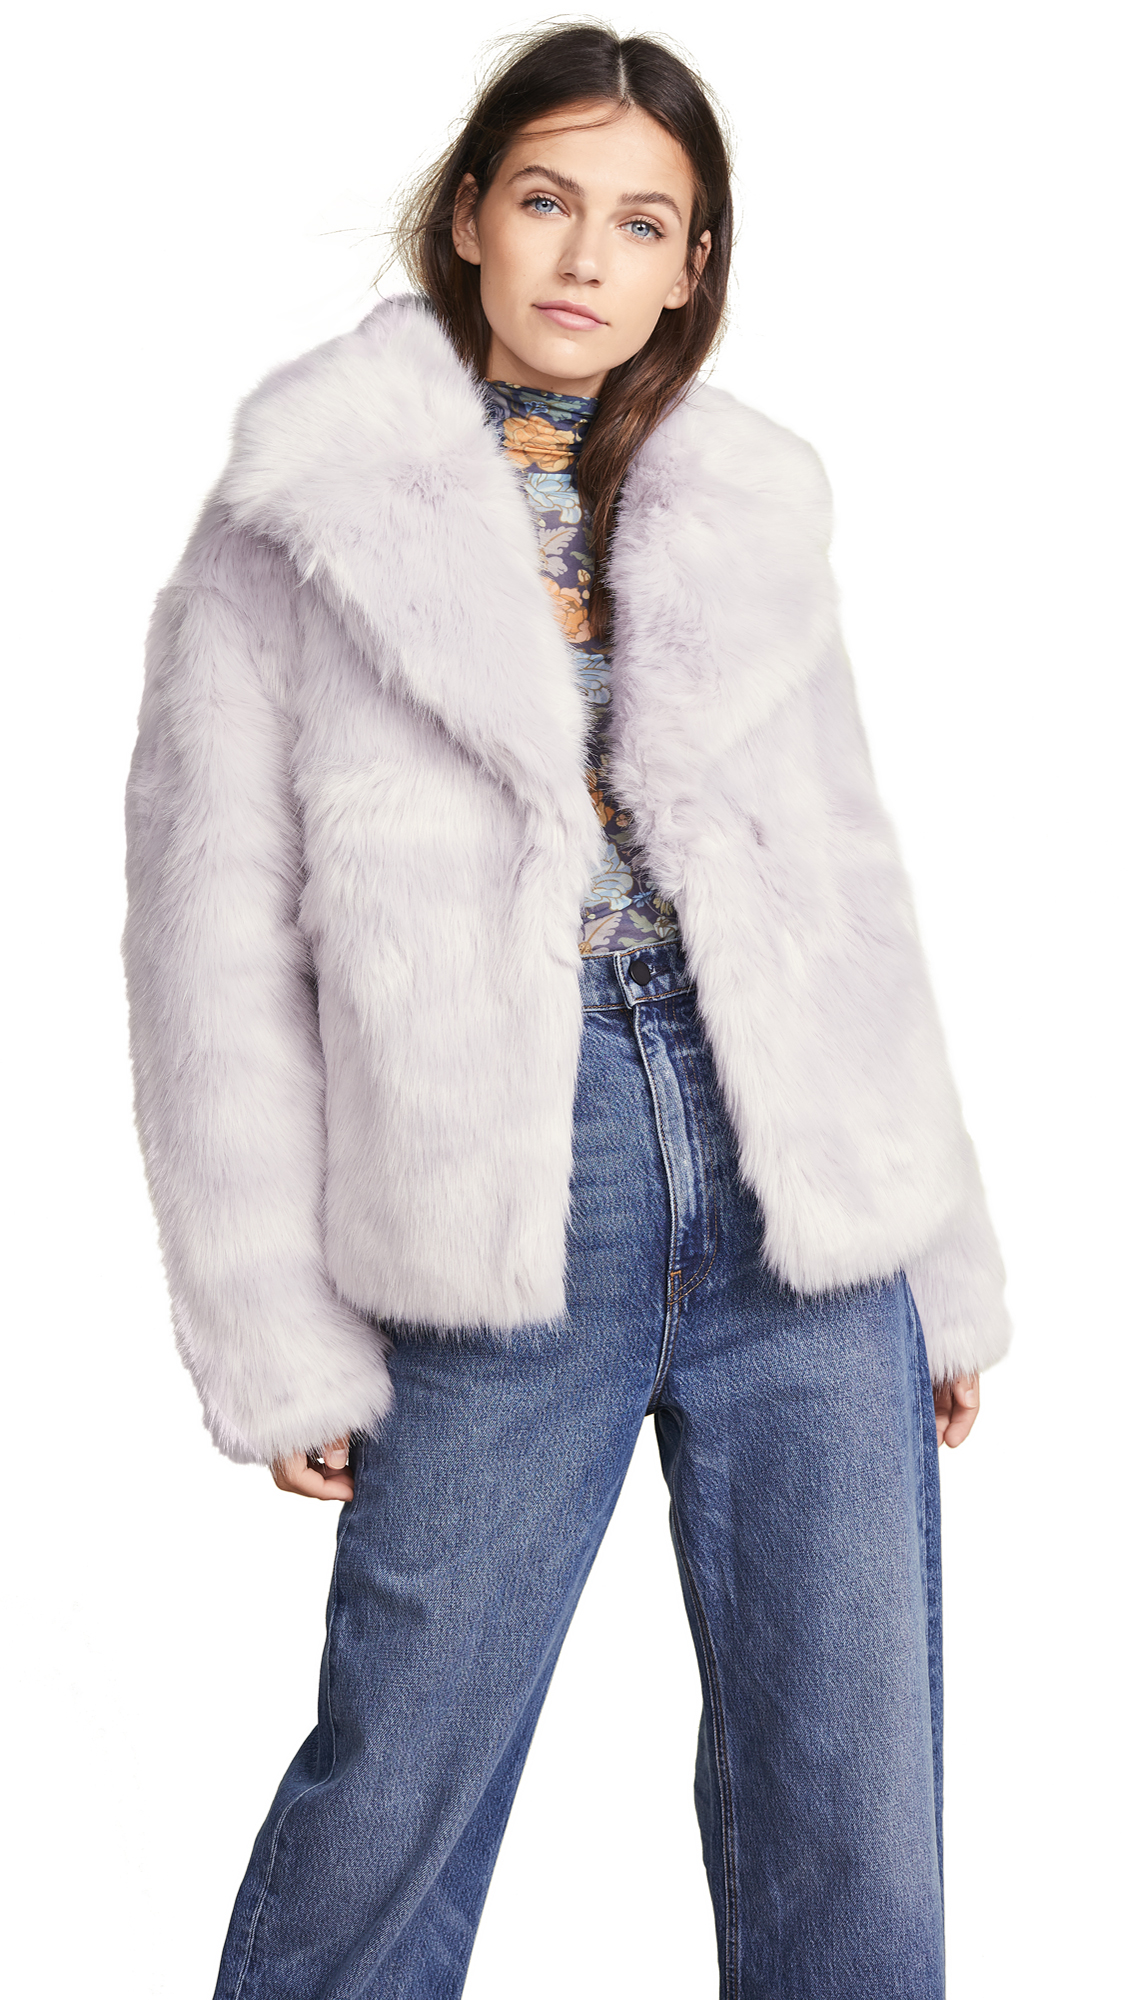 A.L.C. Grant Jacket In Light Lavender